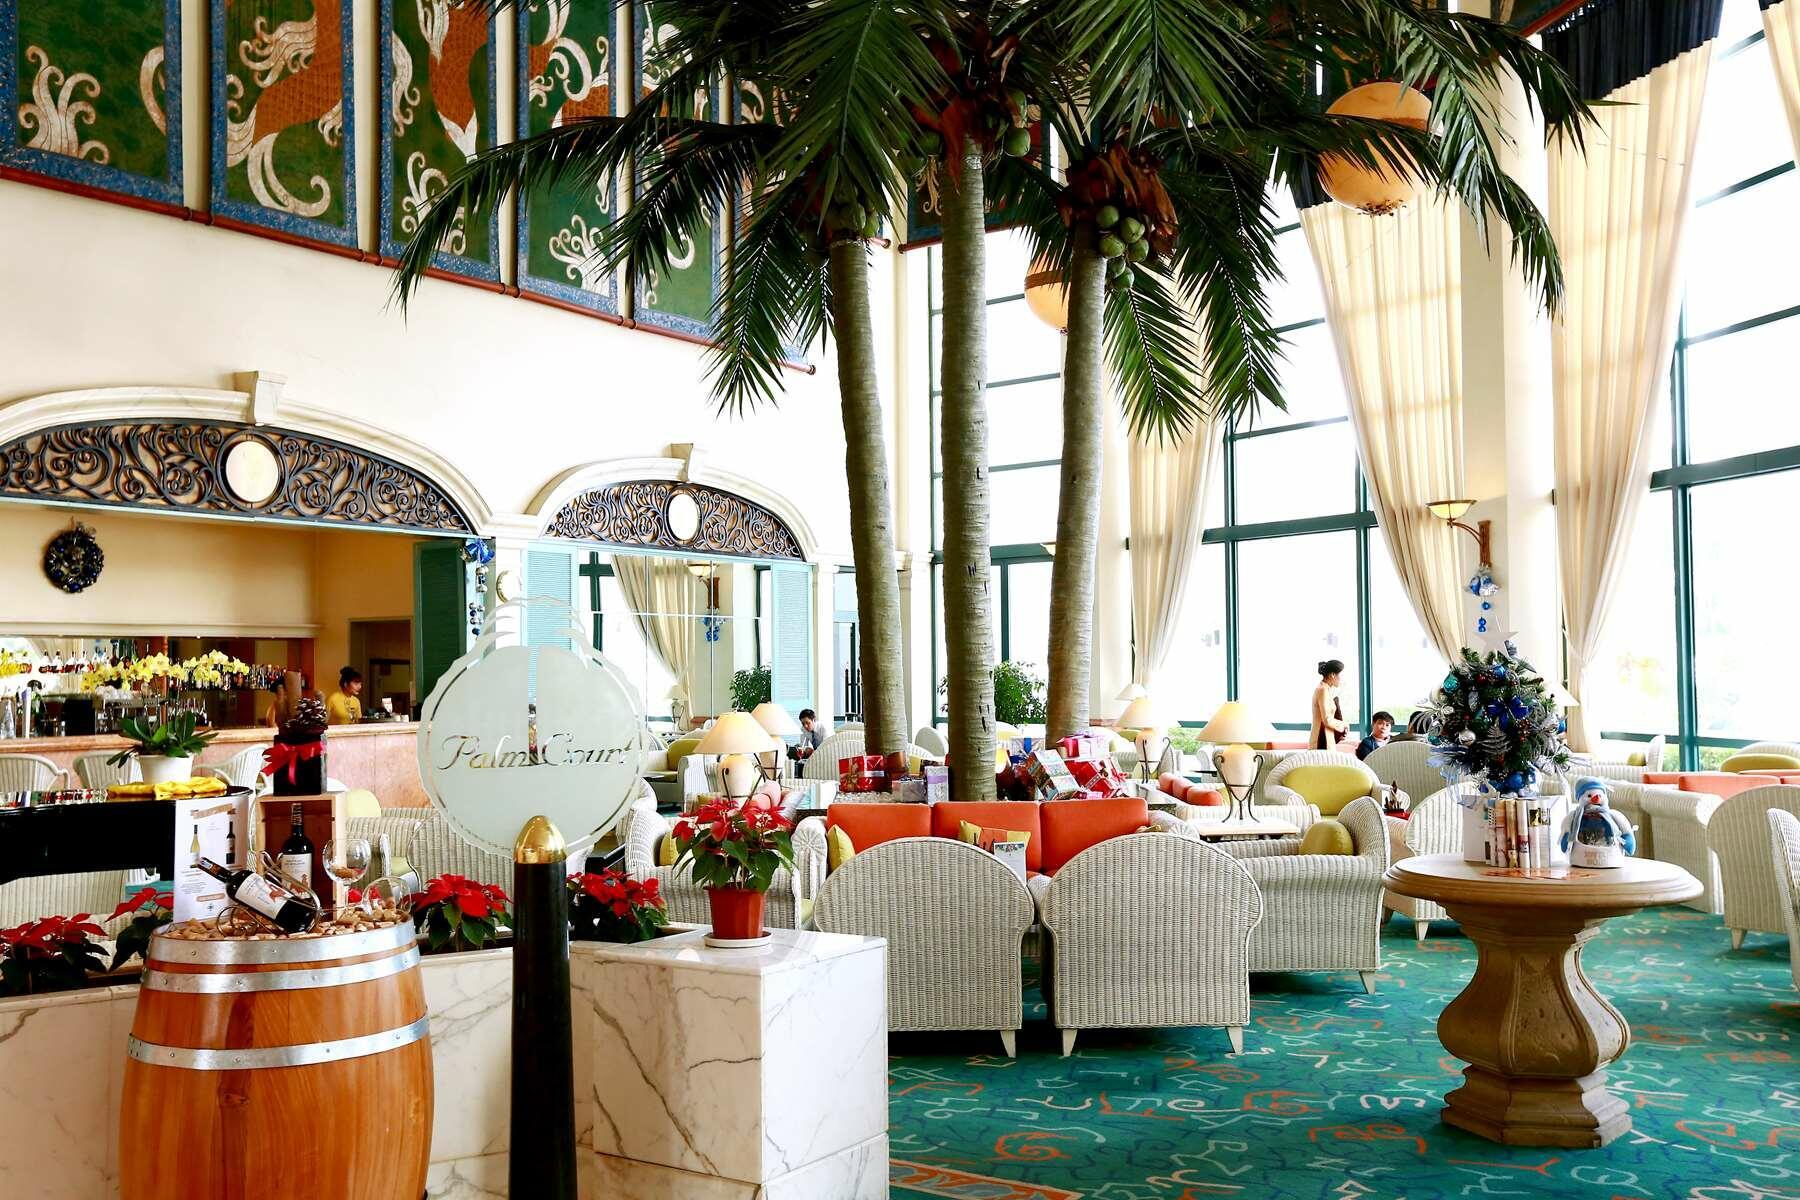 Dining at Hanoi Daewoo Hotel   Hotel Buffet Restaurants in Hanoi